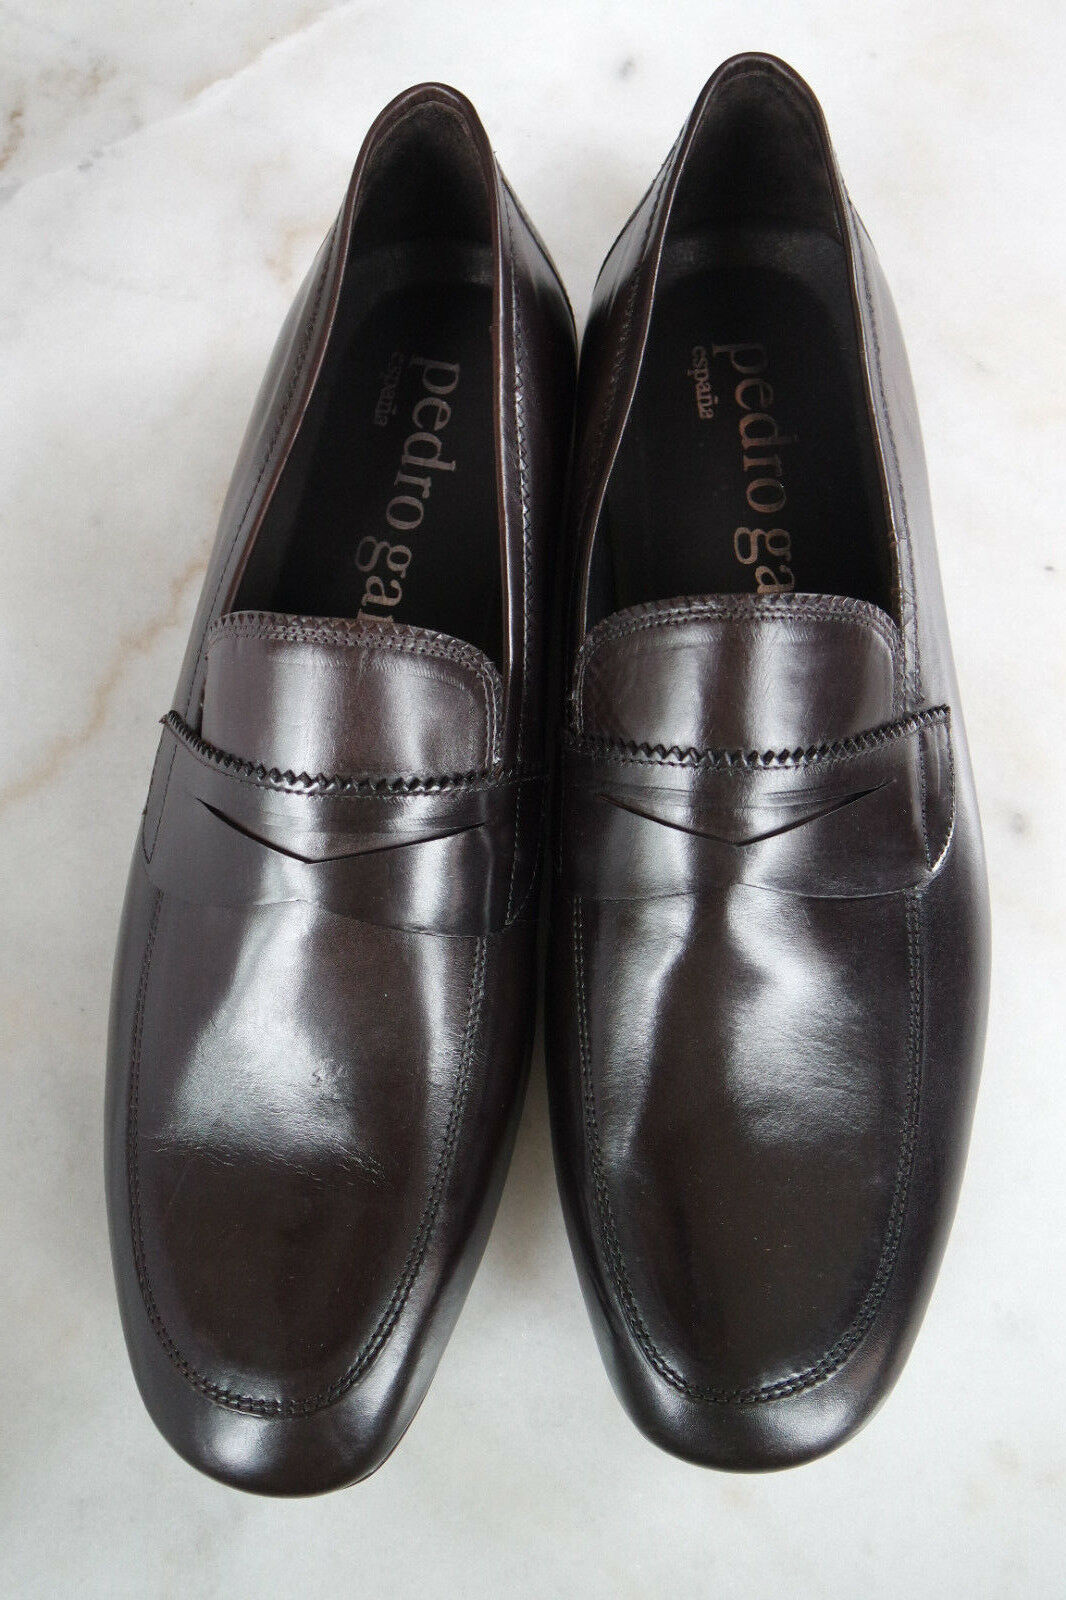 PEDRO GARCIA Men's Dark Brown Leather Slip-Ons Venetians Moccasins Loafers shoes